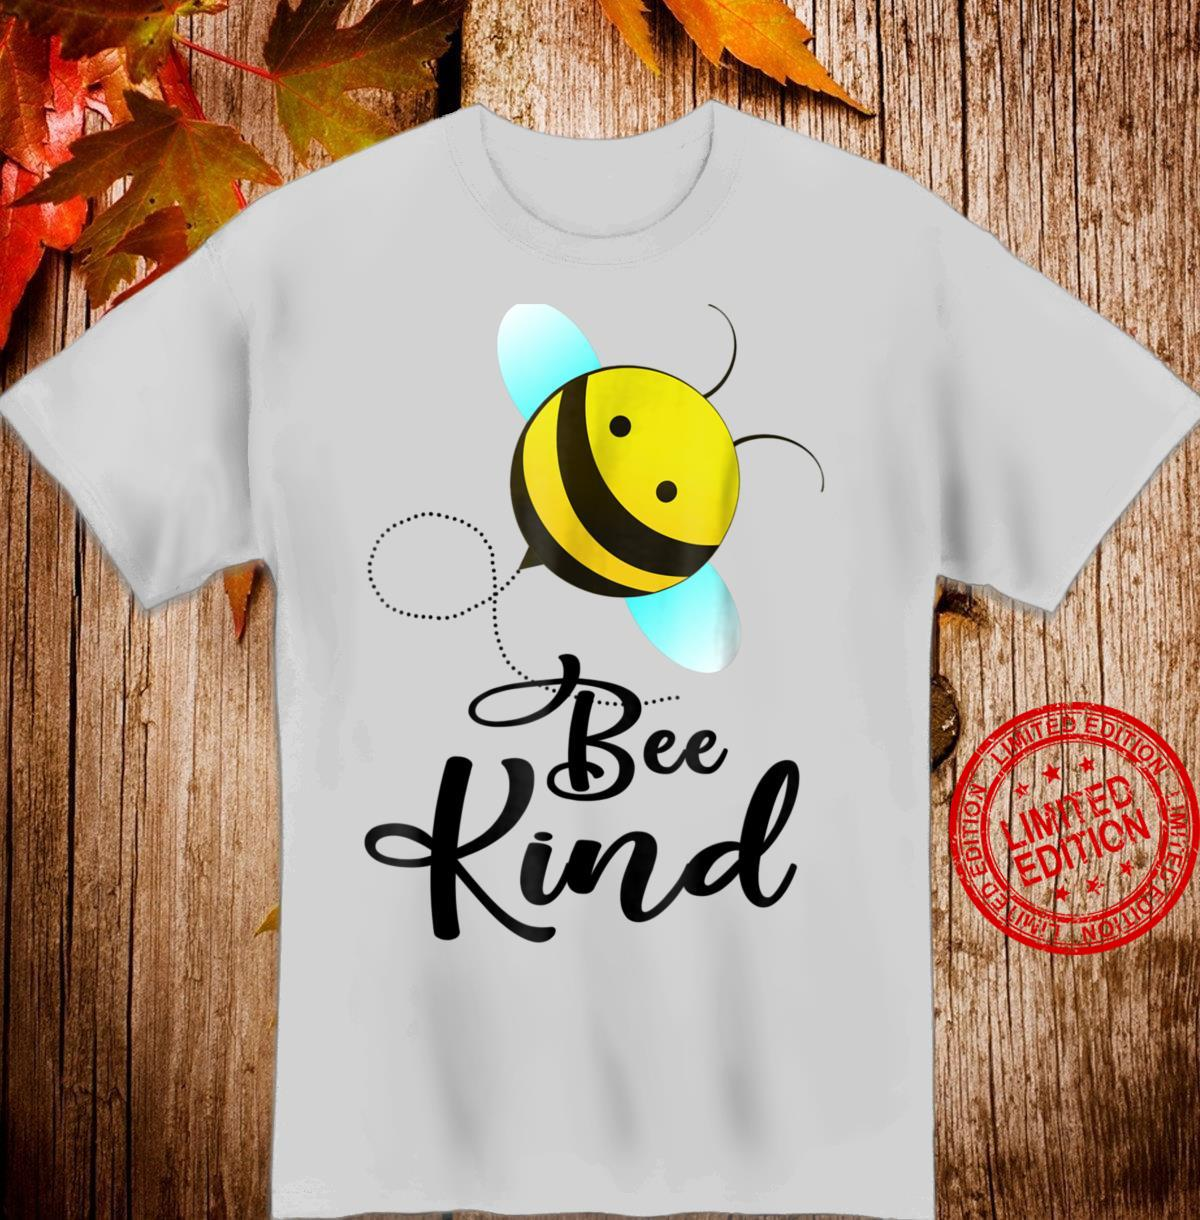 Bee kind Shirt Bumble bee Shirt for kindness Shirt